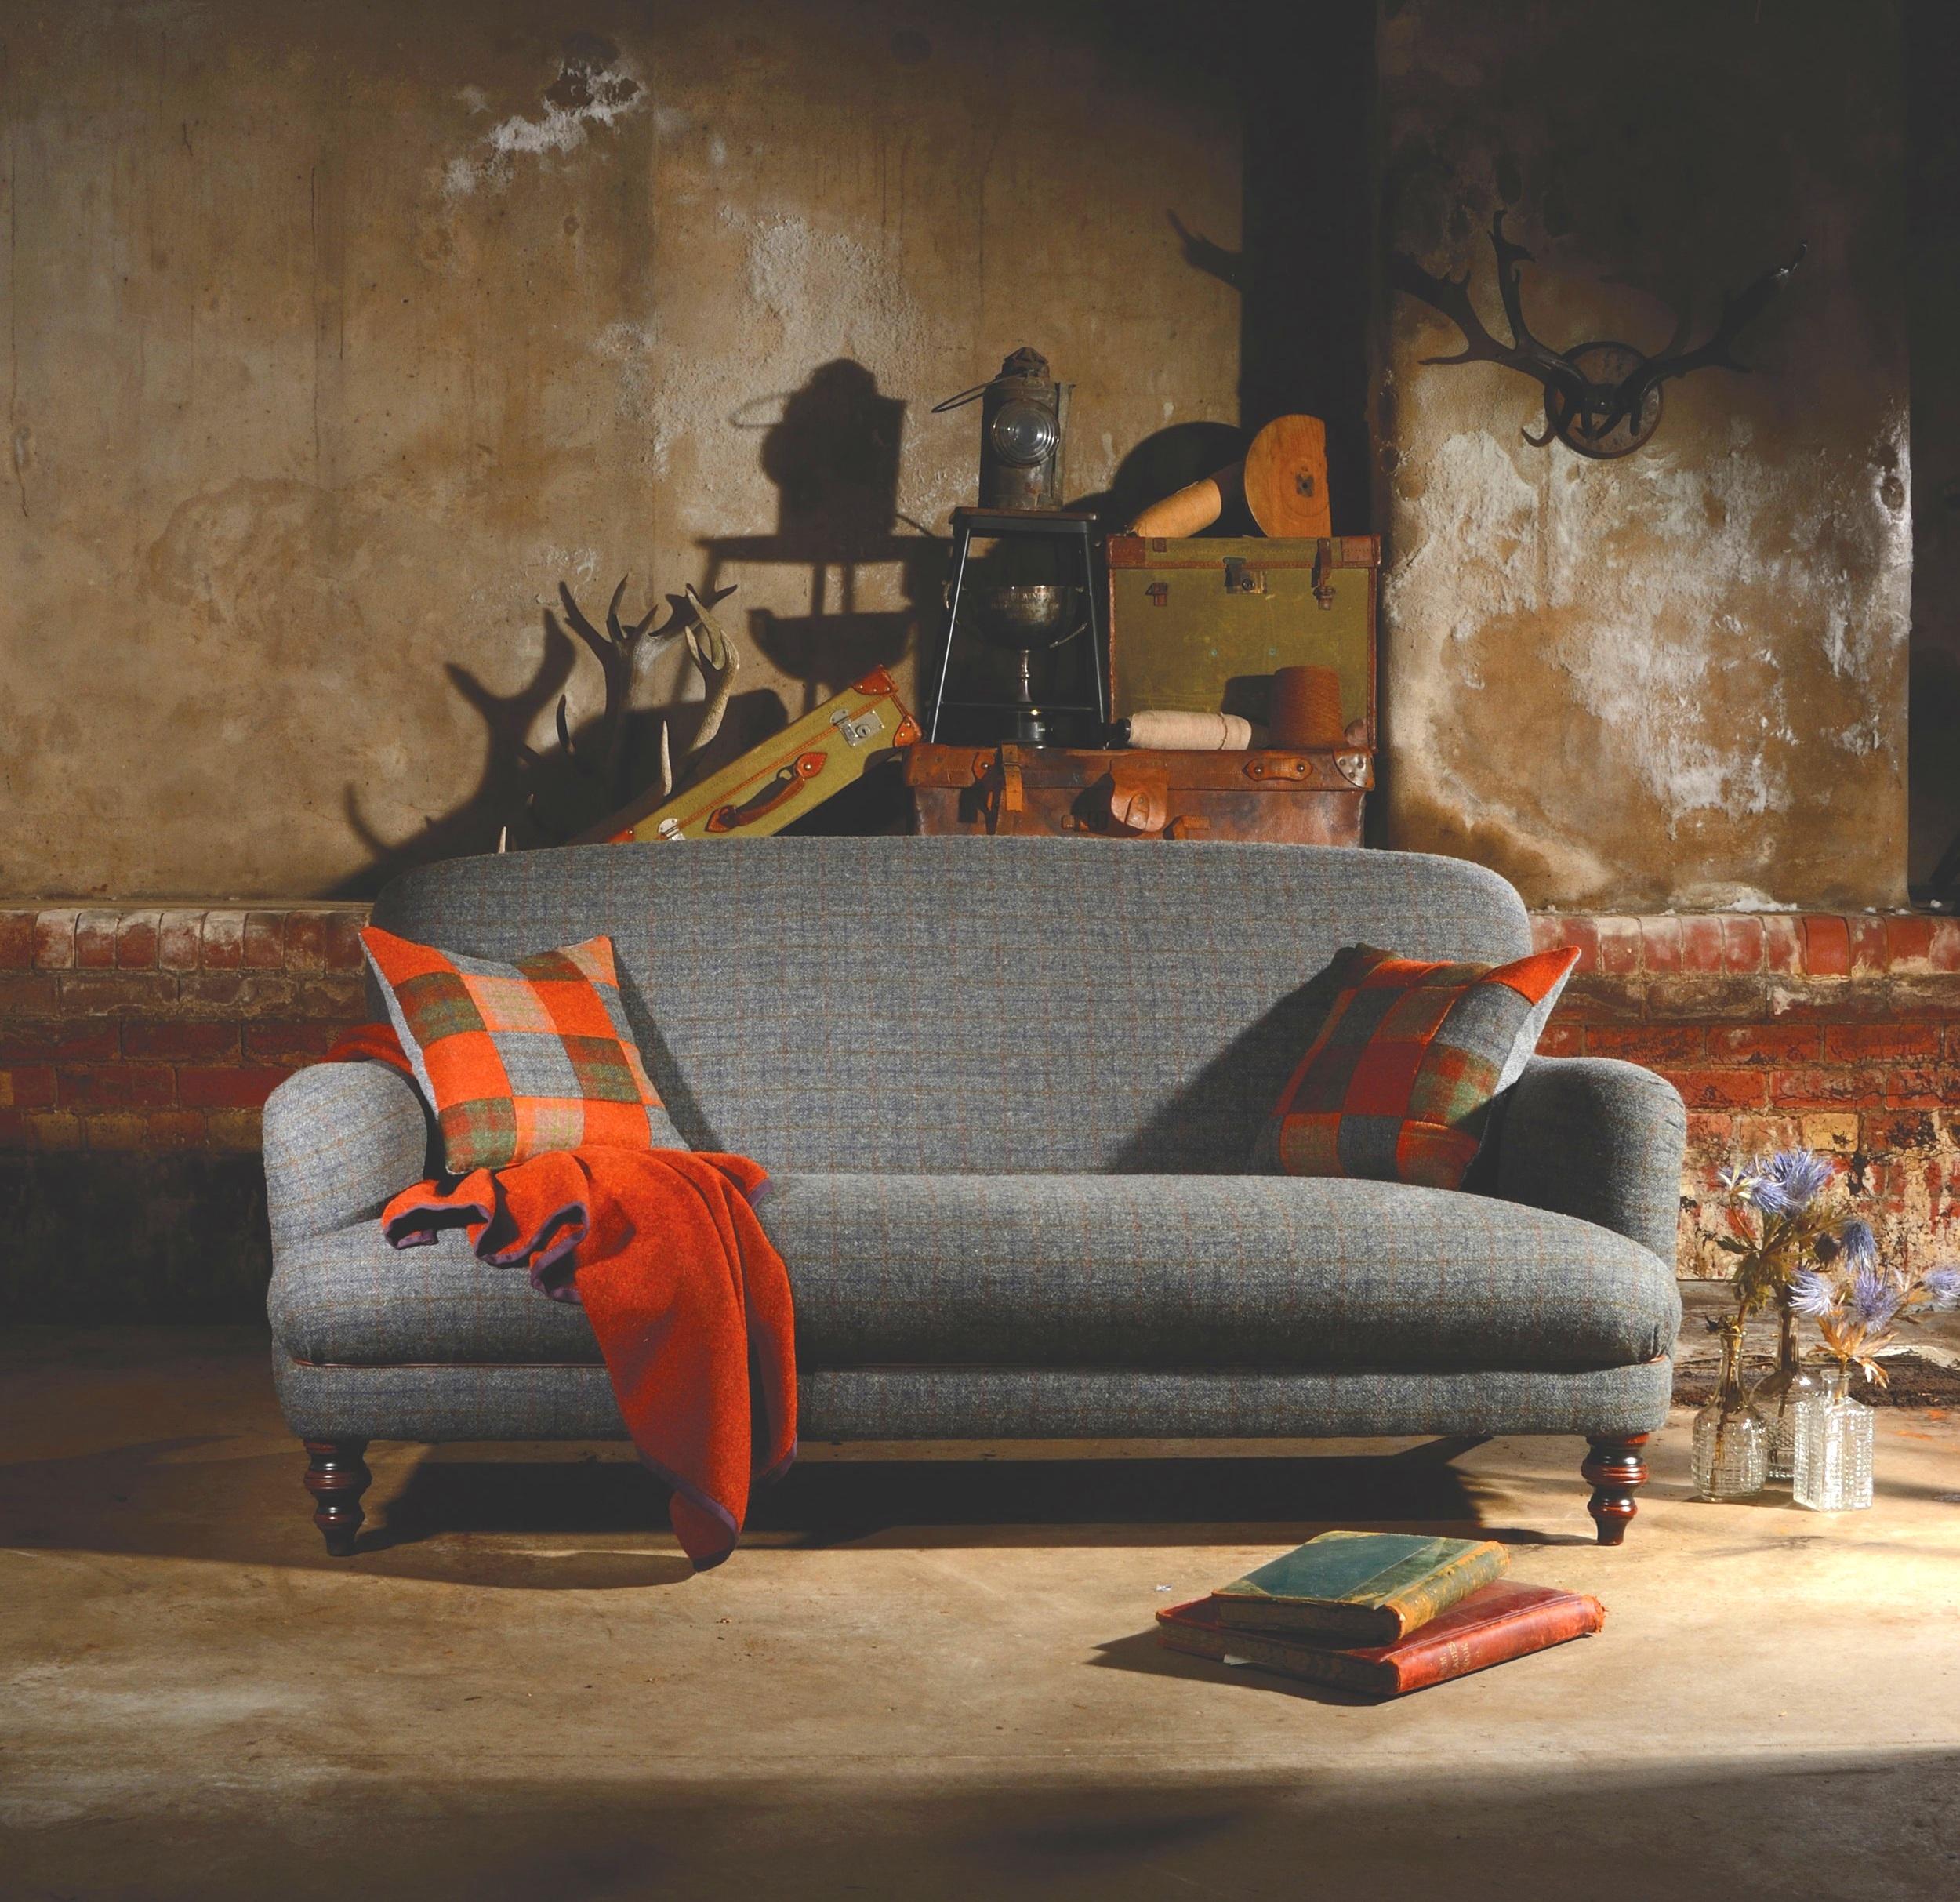 The Braemar   Midi Sofa: 185(W) 102(D) 88(H)  Petit Sofa: 155(W) 102(D) 88(H)  Chair: 88(W) 102(D) 88(H)  Chair: 88(W) 102(D) 88(H)   Sofa prices from:  £1575